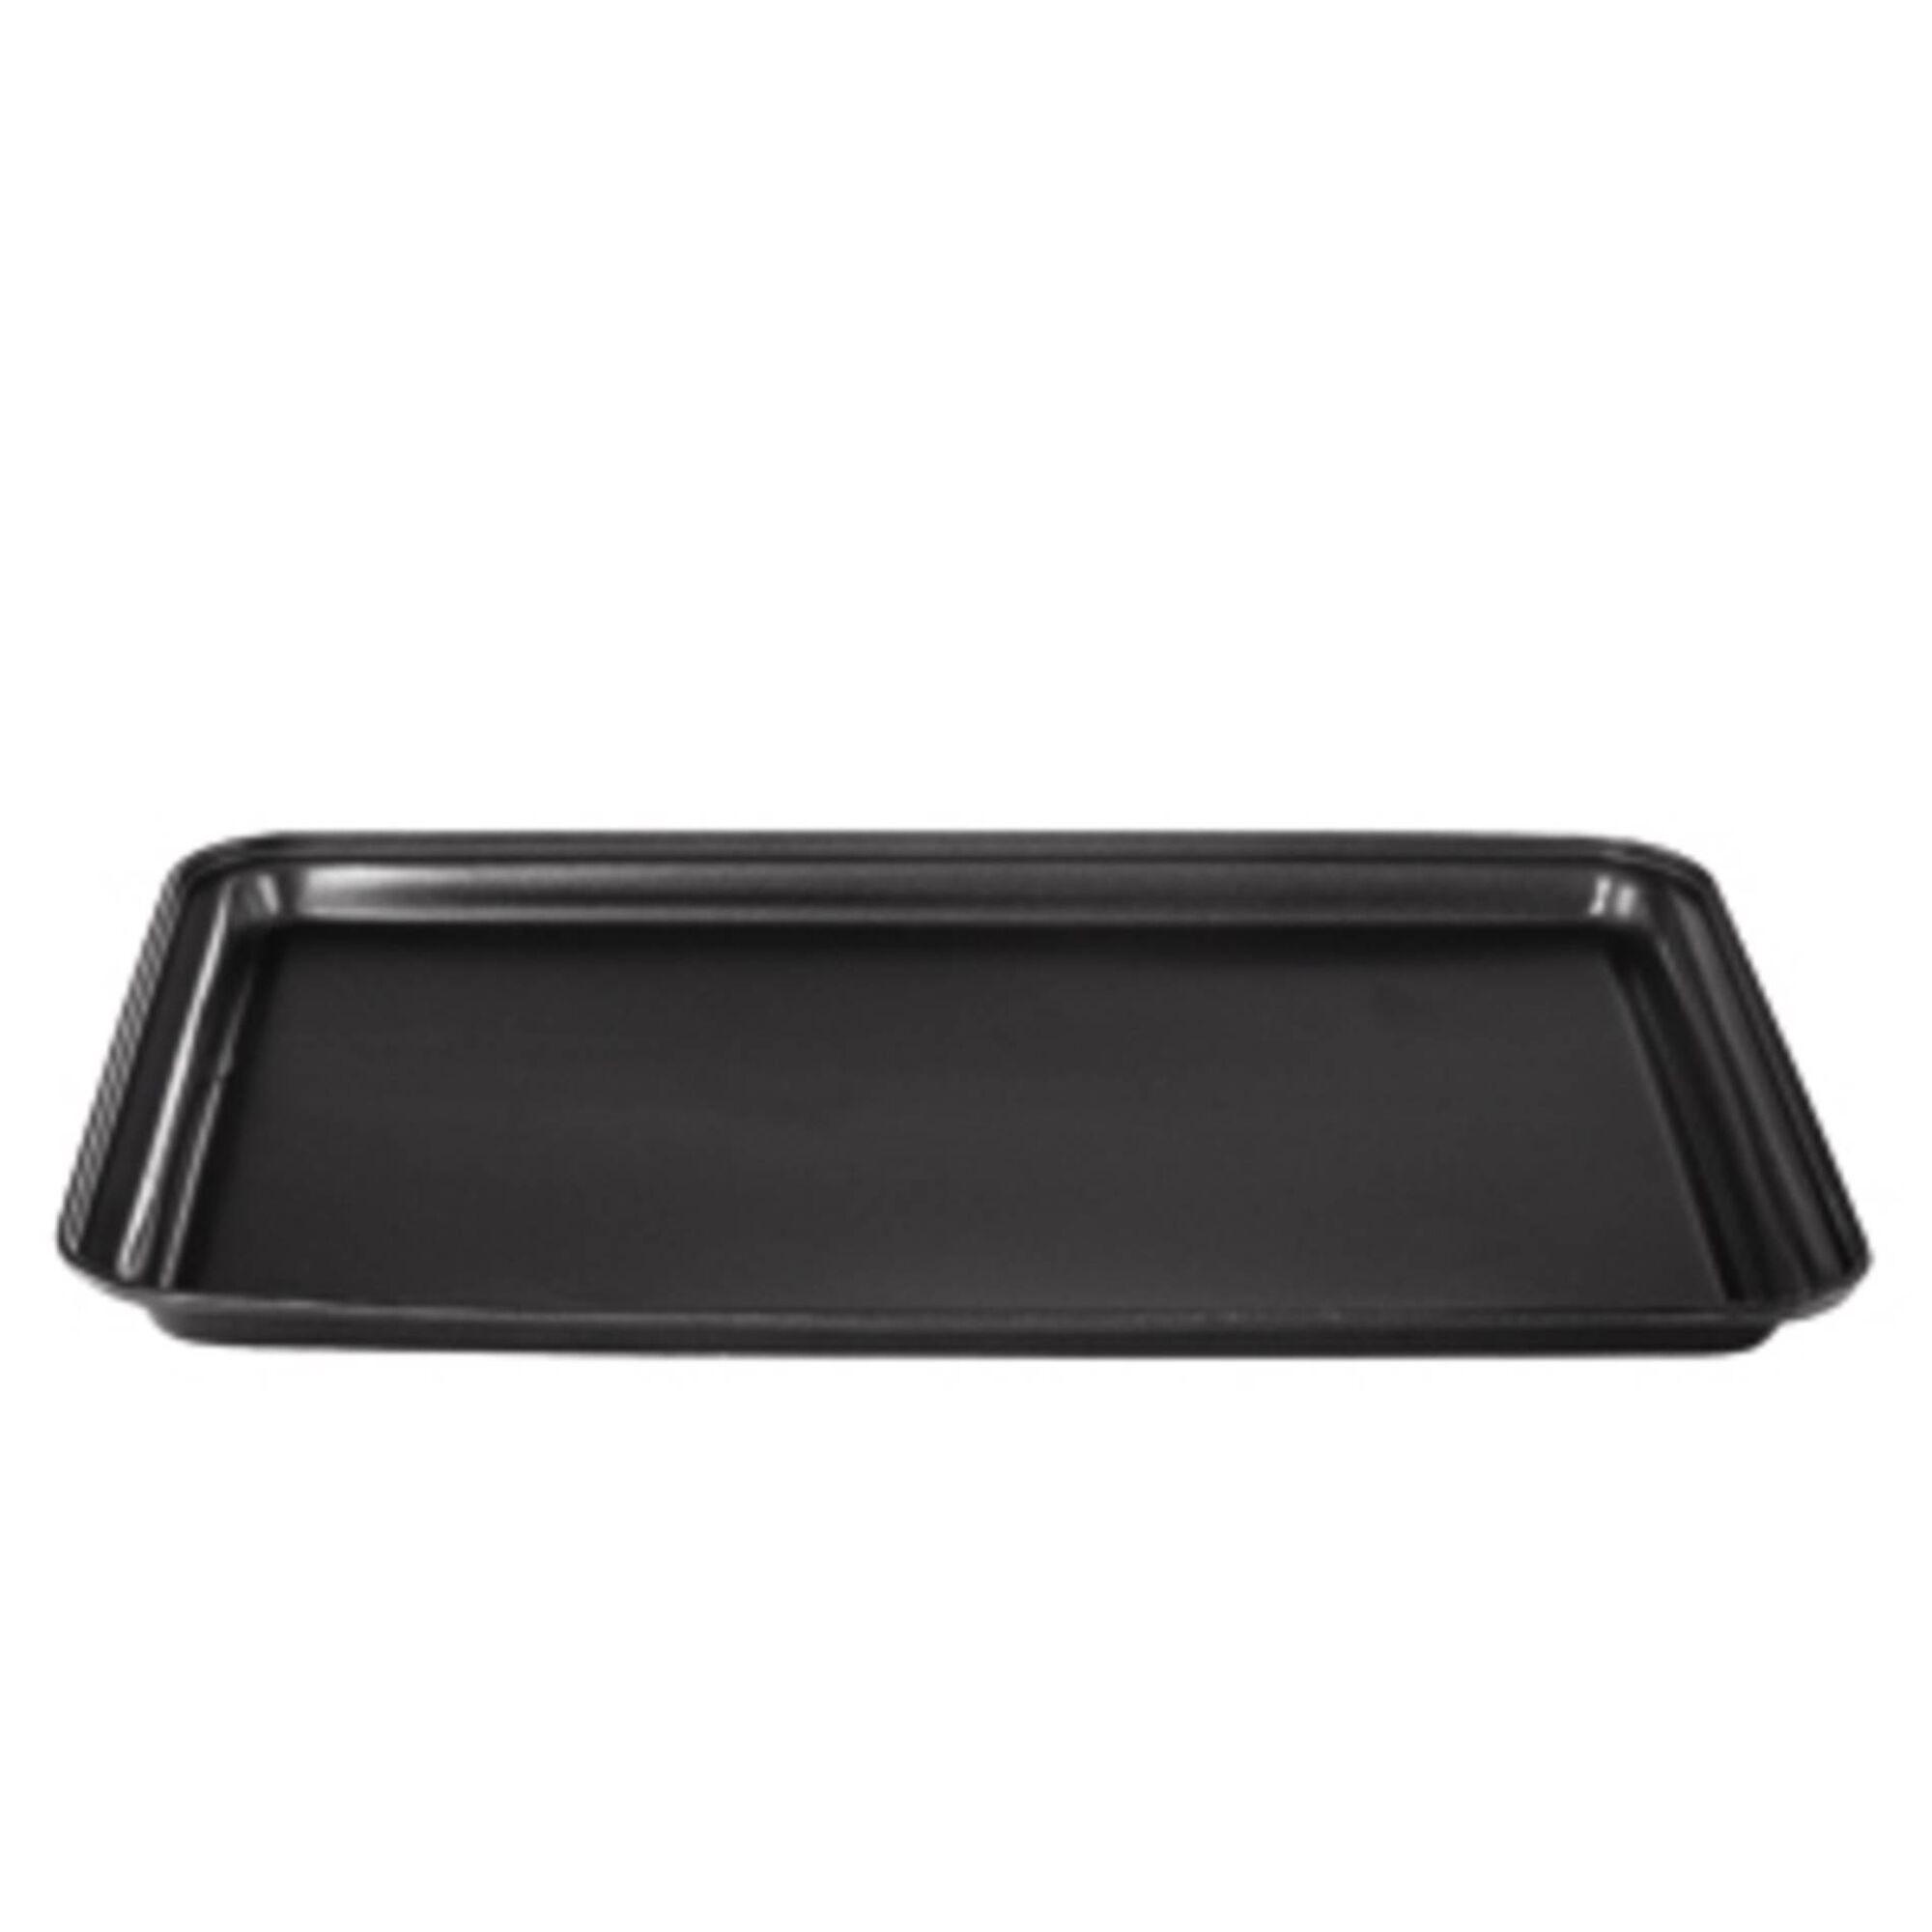 Tabuleiro Forno Aço Carbono 37x26cm Cinza Chefe